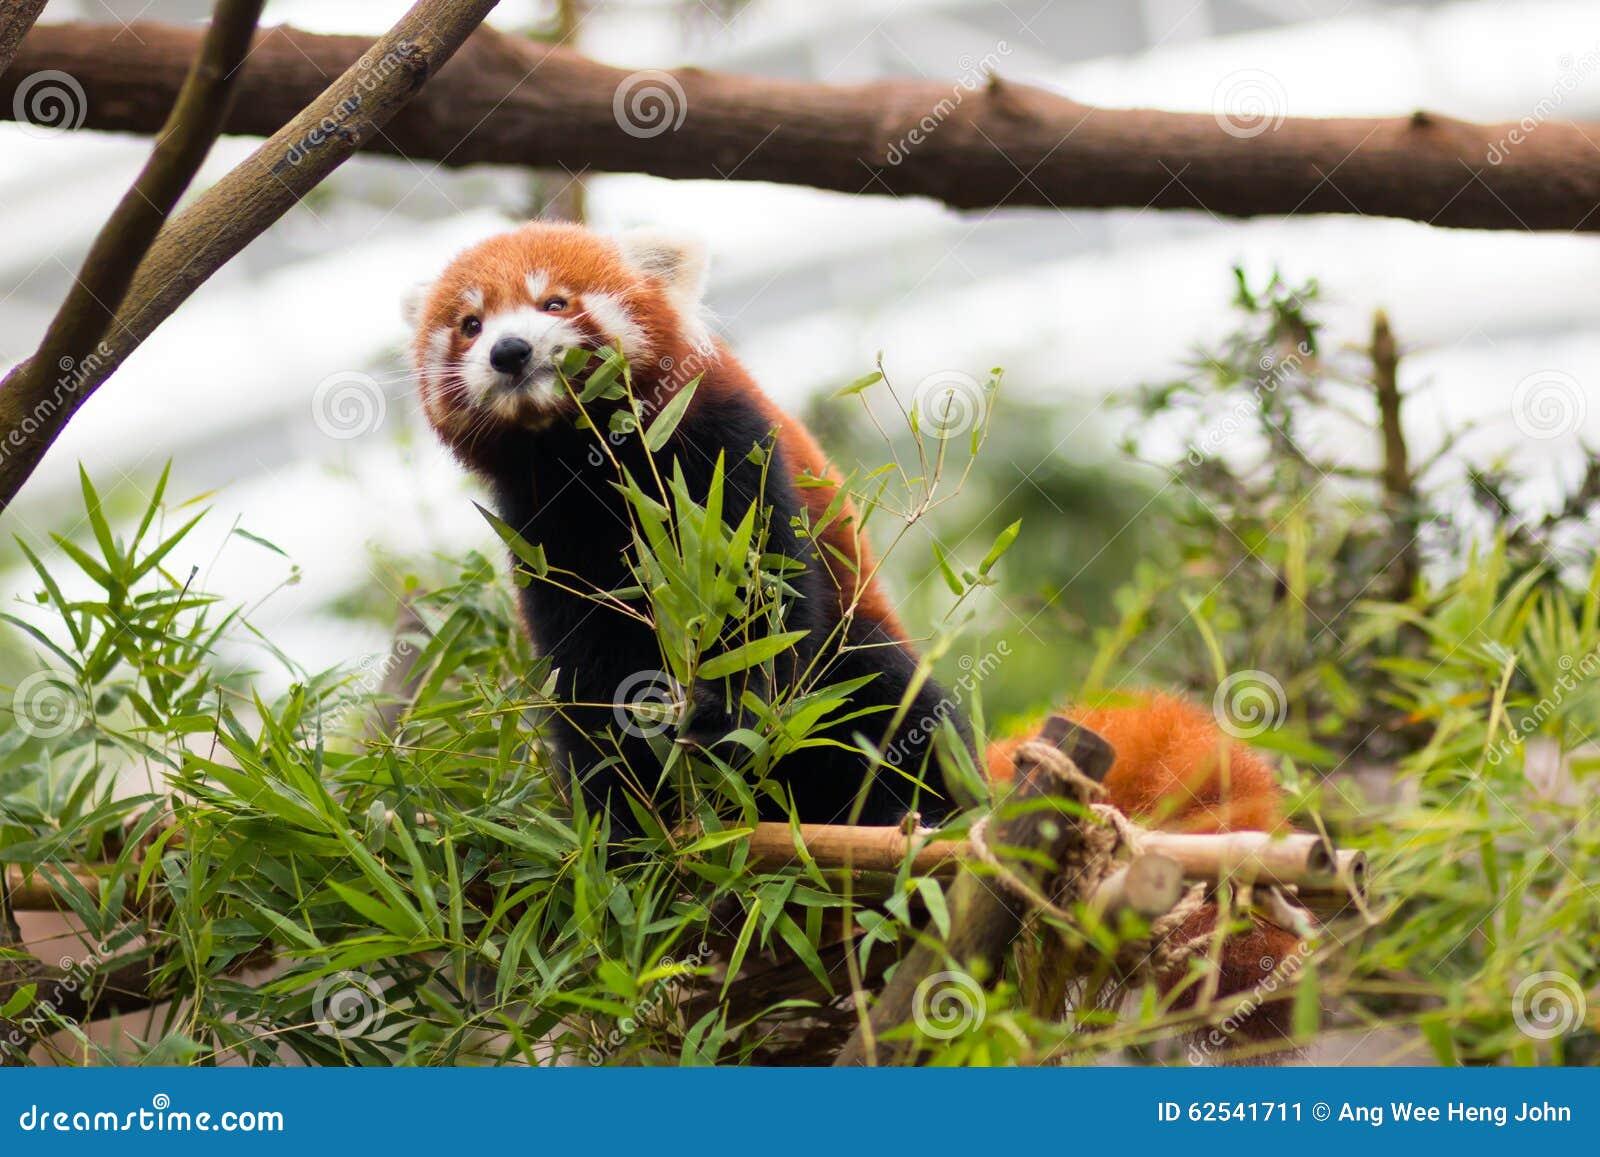 Red Panda Feeding Royalty-Free Stock Photo | CartoonDealer ...